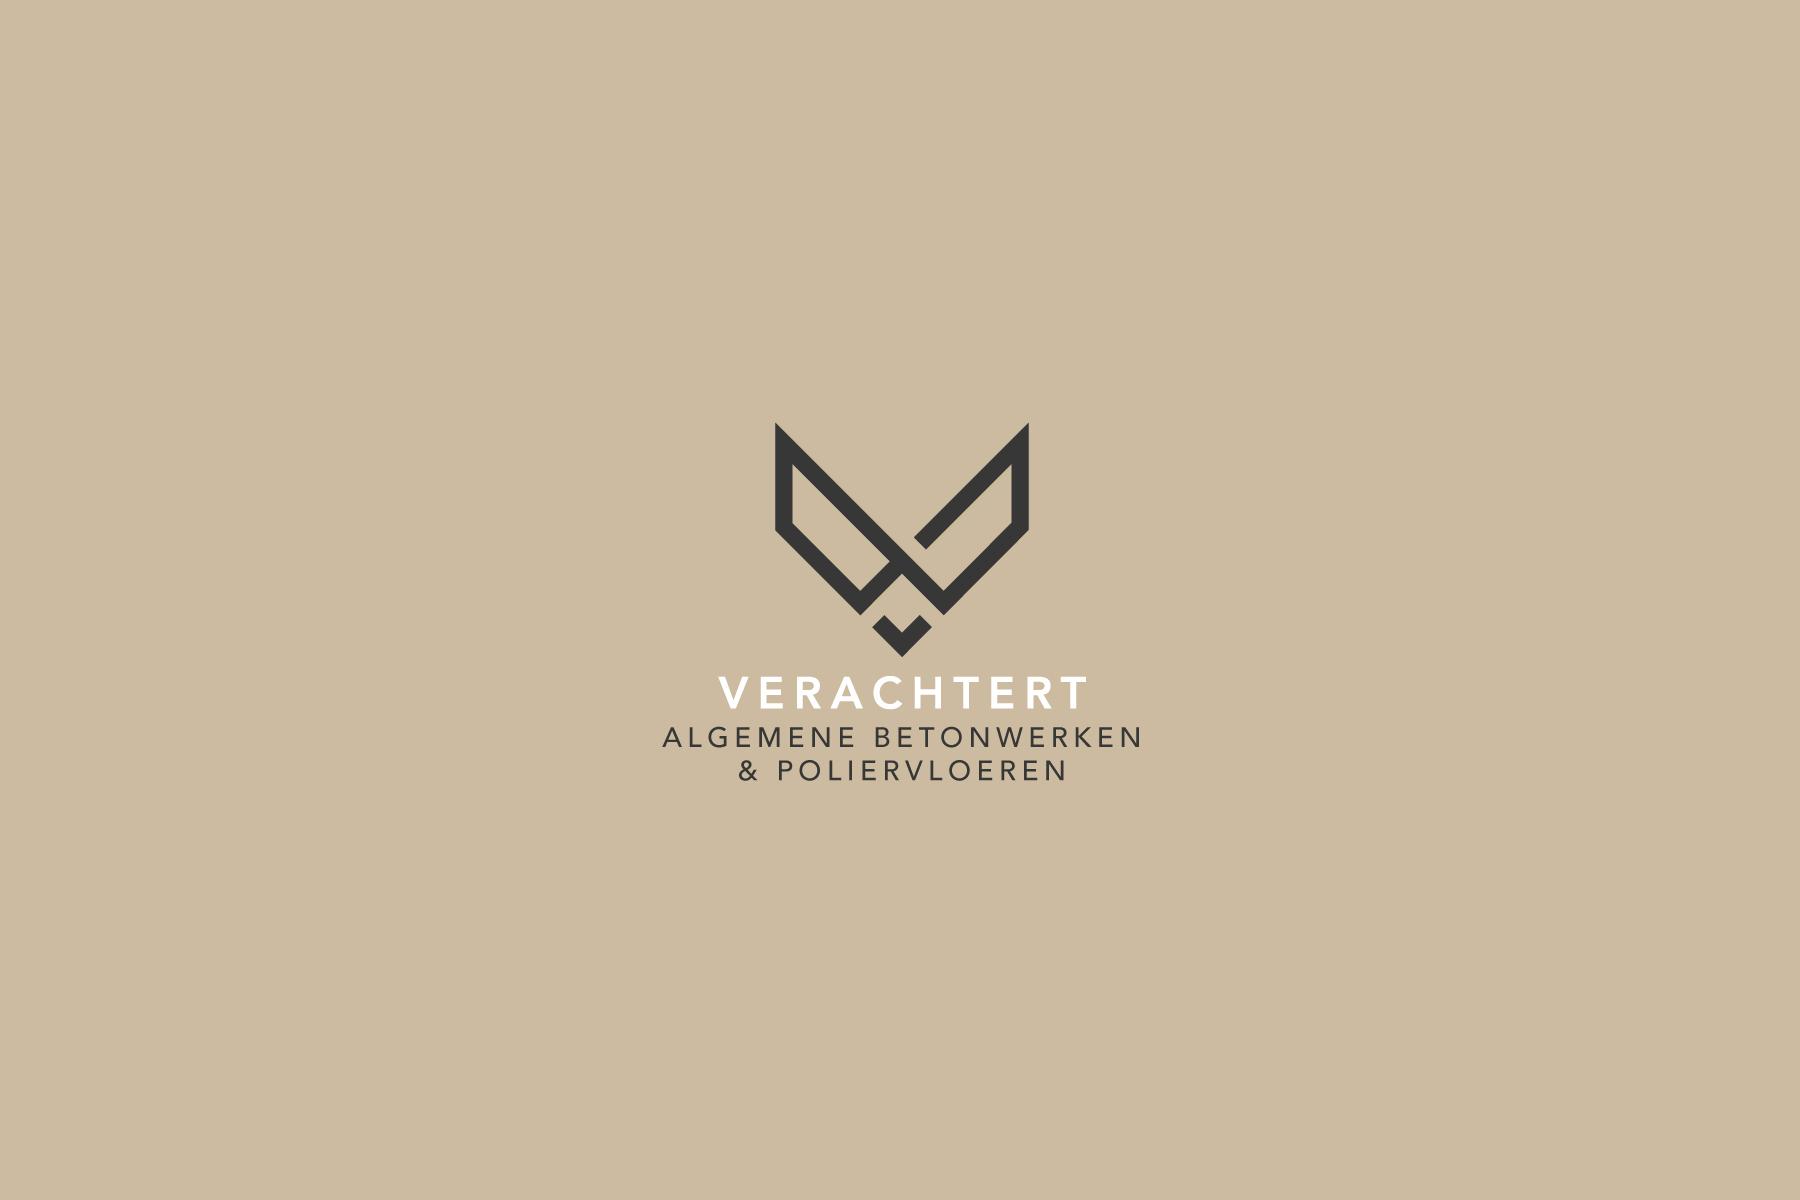 verachtert-betonwerken-poliervloeren-logo